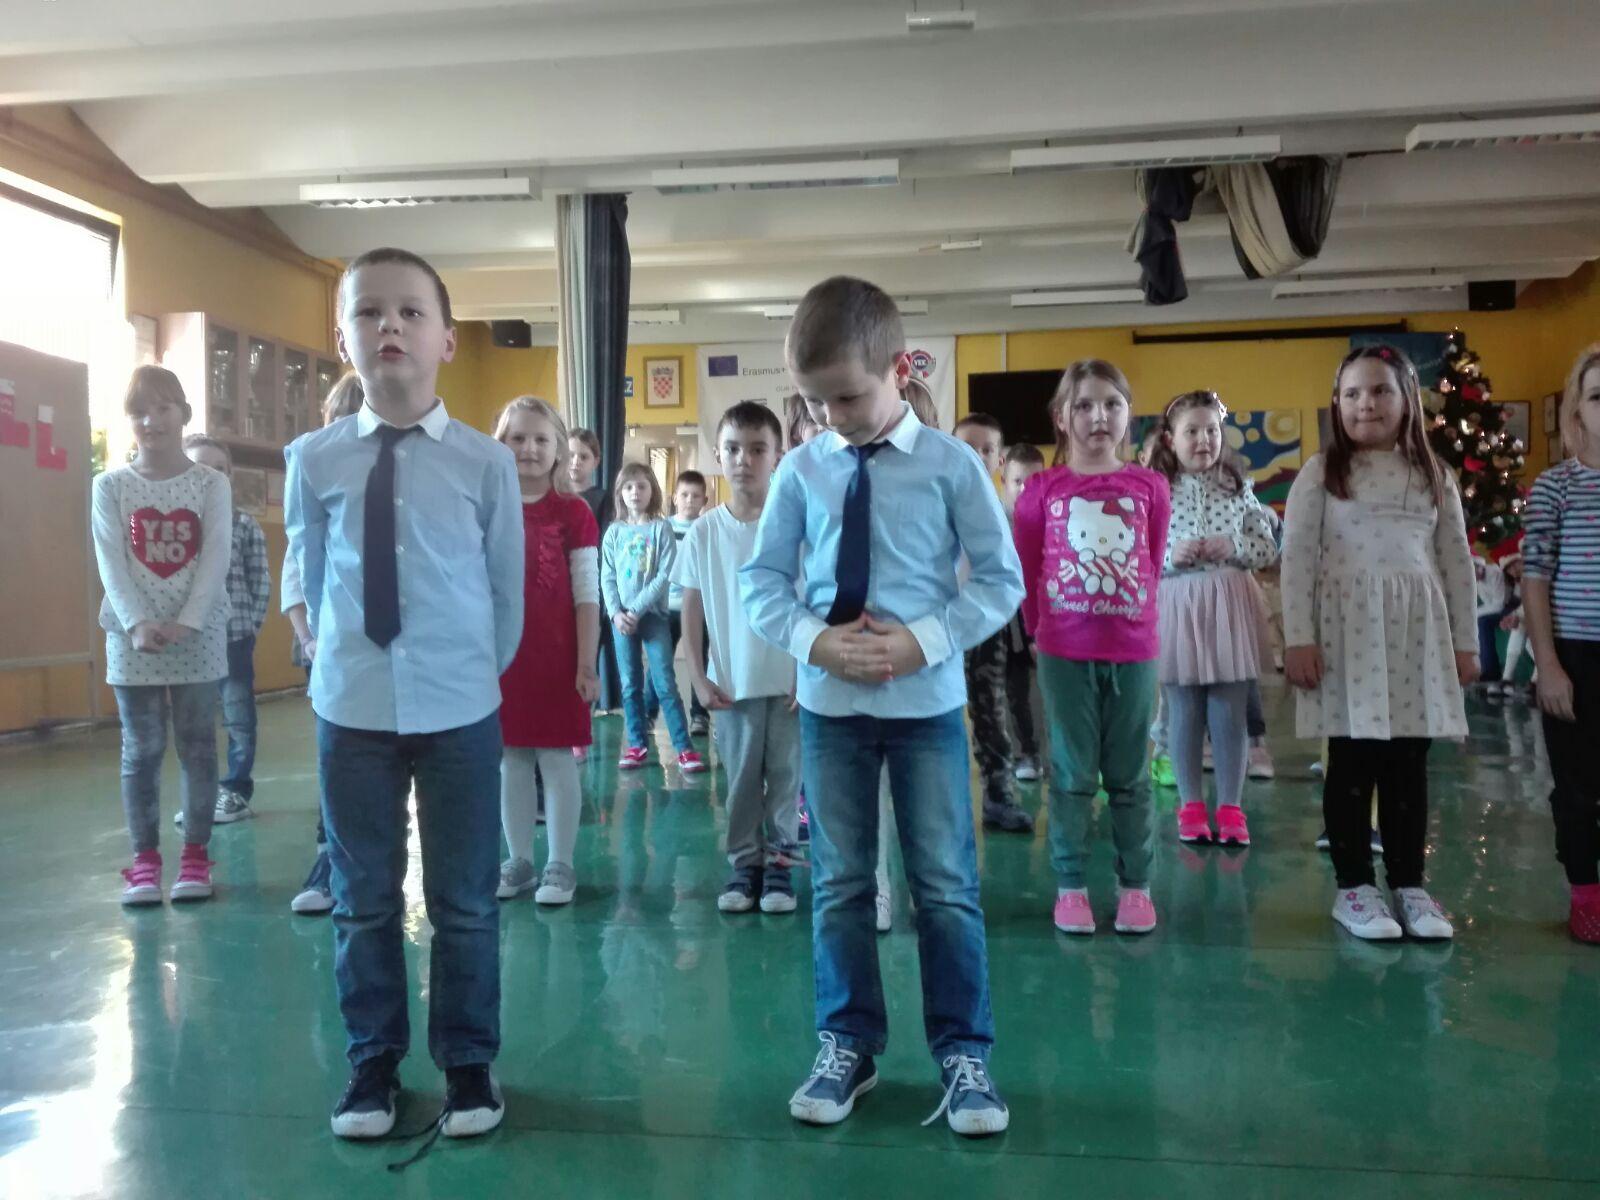 Osnovna Skola Bartola Kasica Vinkovci Naslovnica Sv Nikola